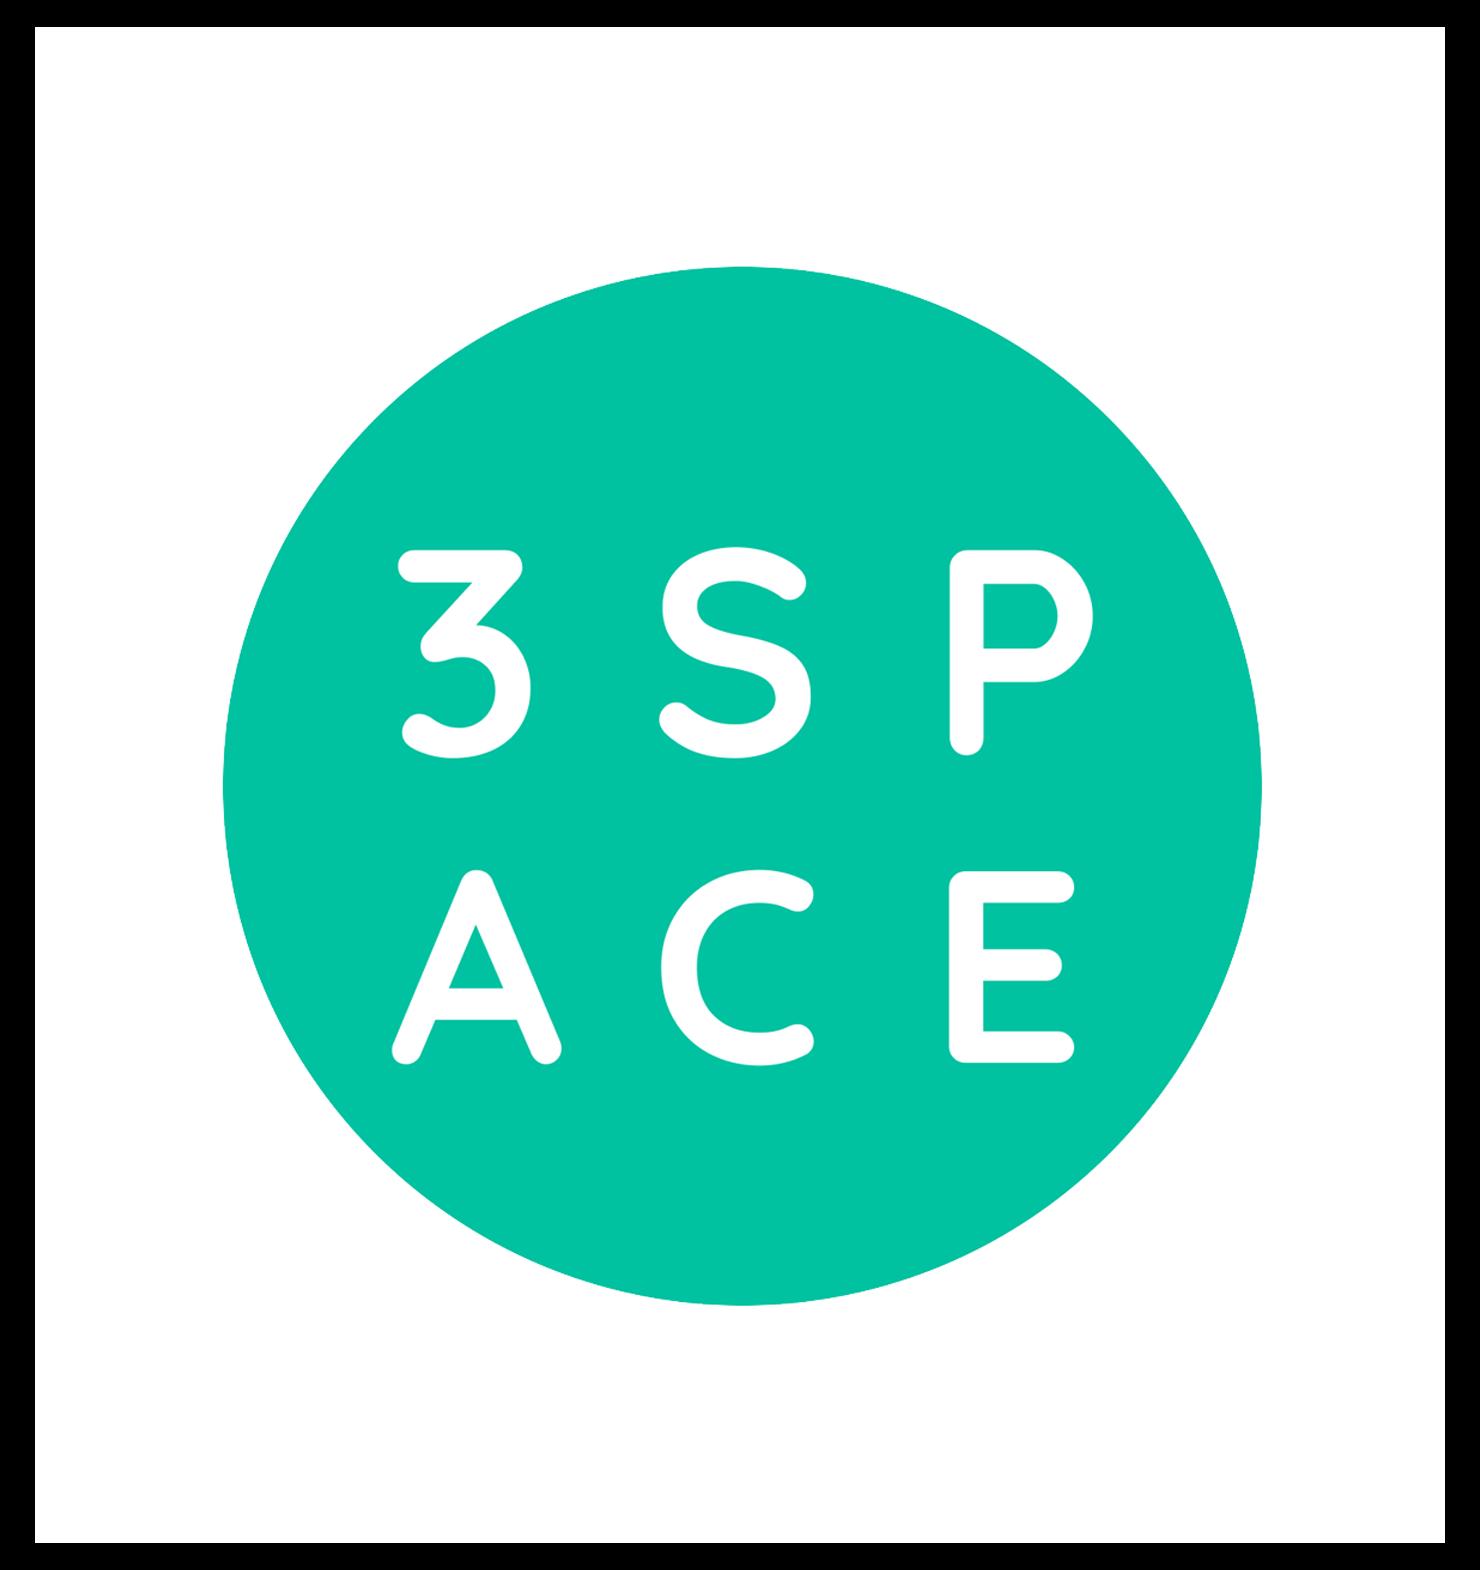 3SPACE  Work space facilities partnership